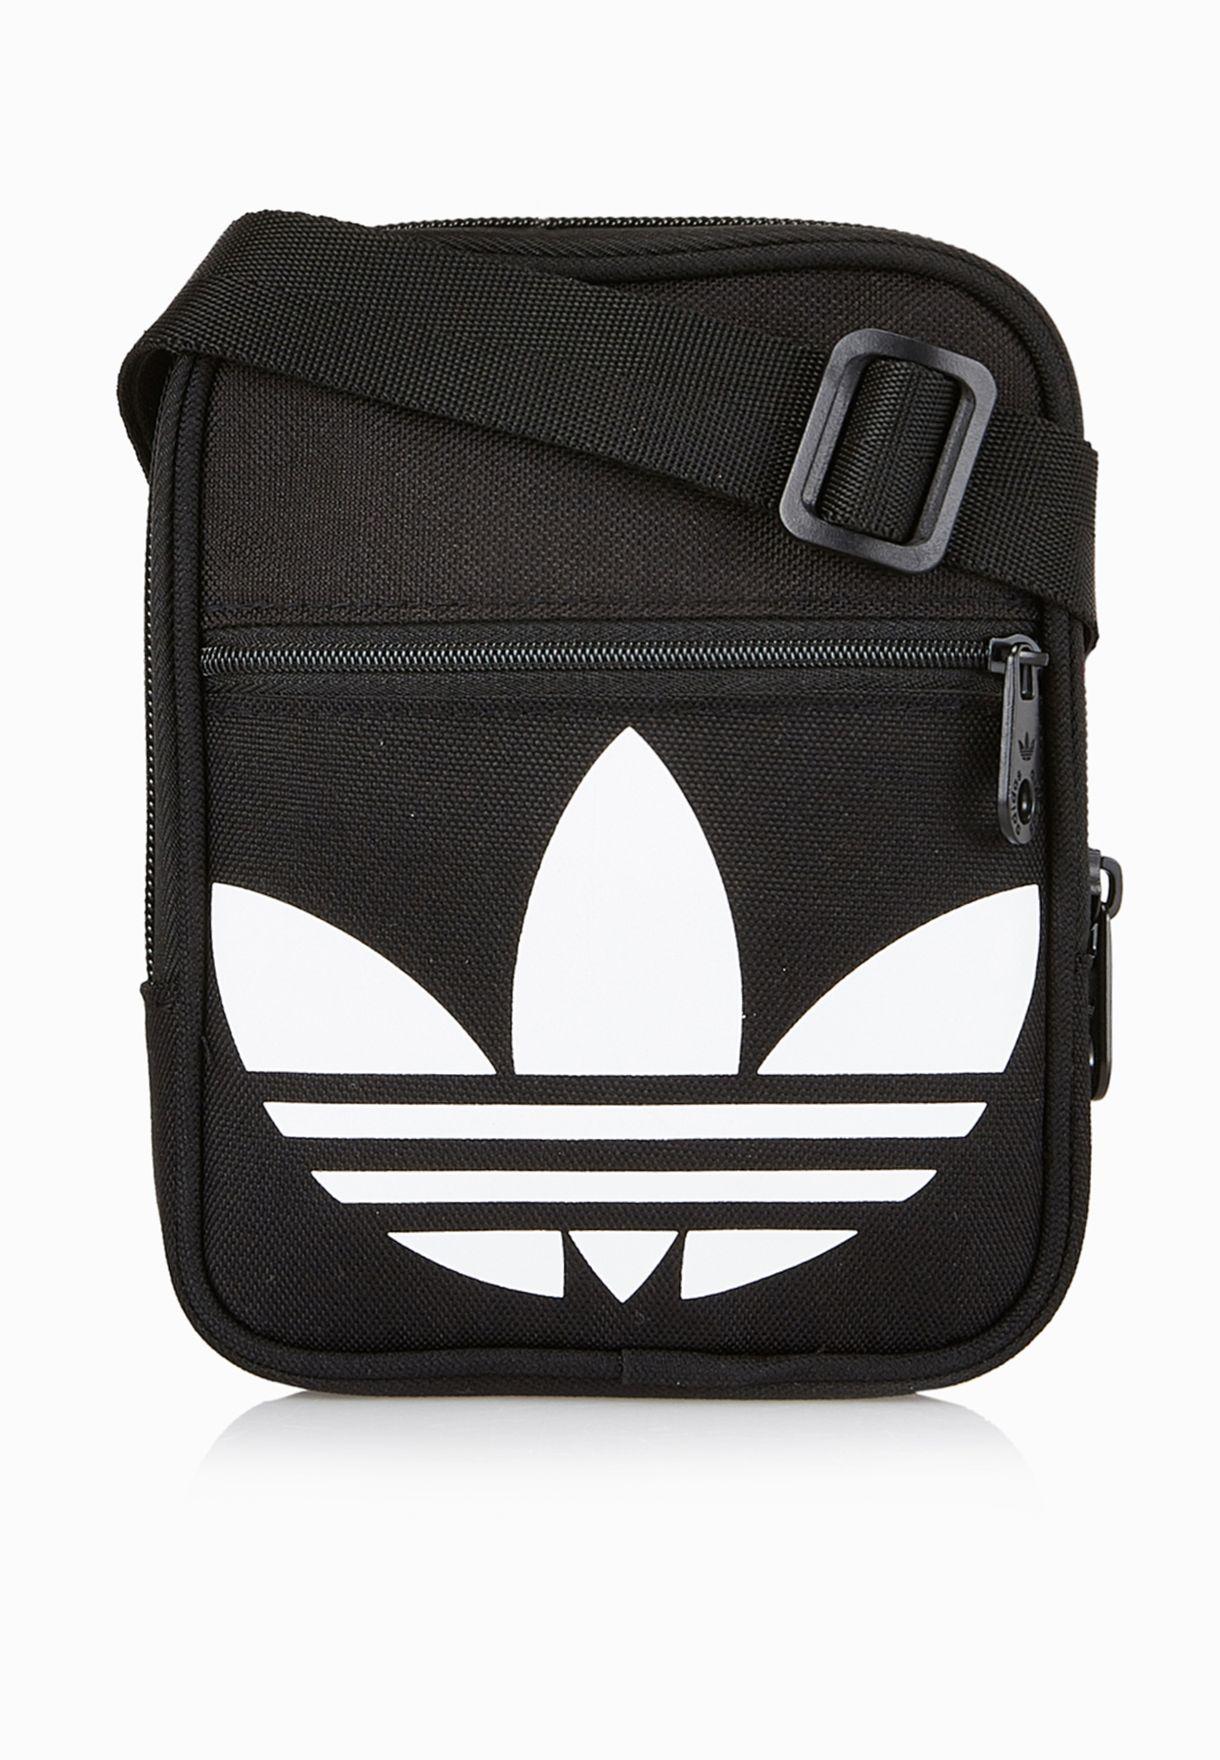 97887f95d2a6 Shop adidas Originals black Trefoil Festival Messenger AJ8991 for Men in  Saudi - AD478AC59BEY